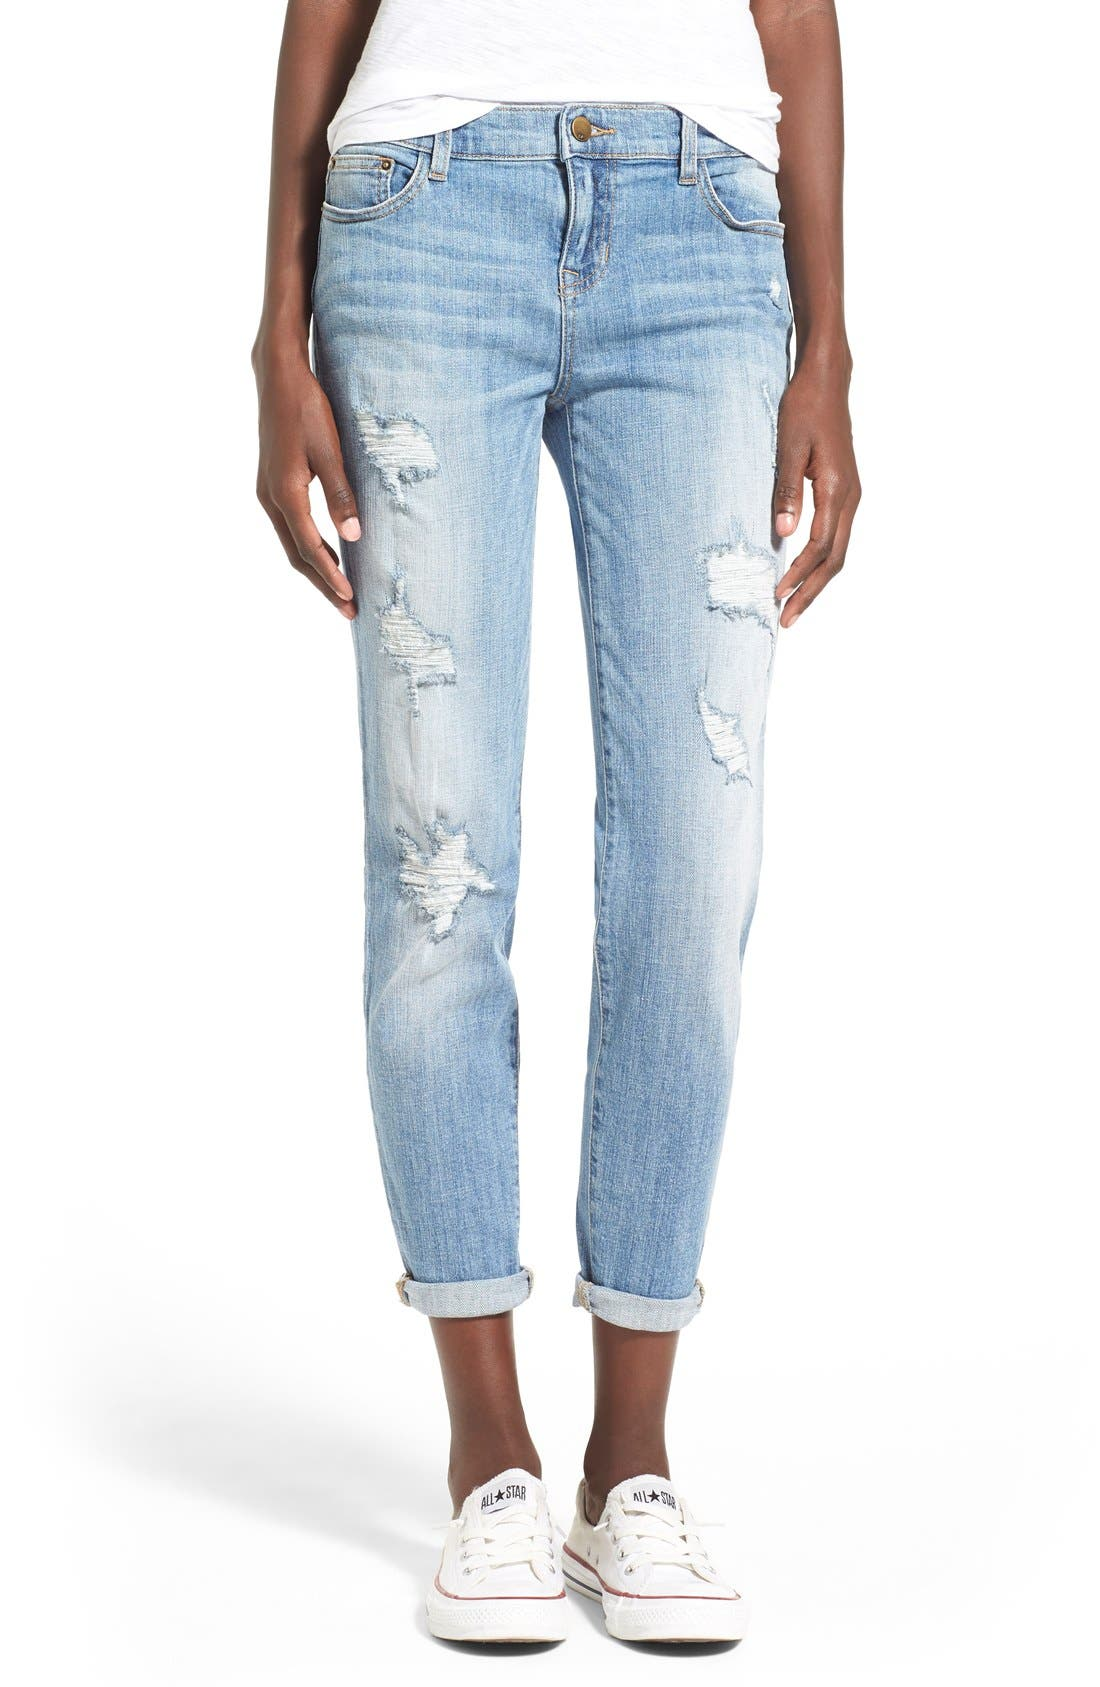 Main Image - SPBlackDestroyed BoyfriendJeans(LTWash)